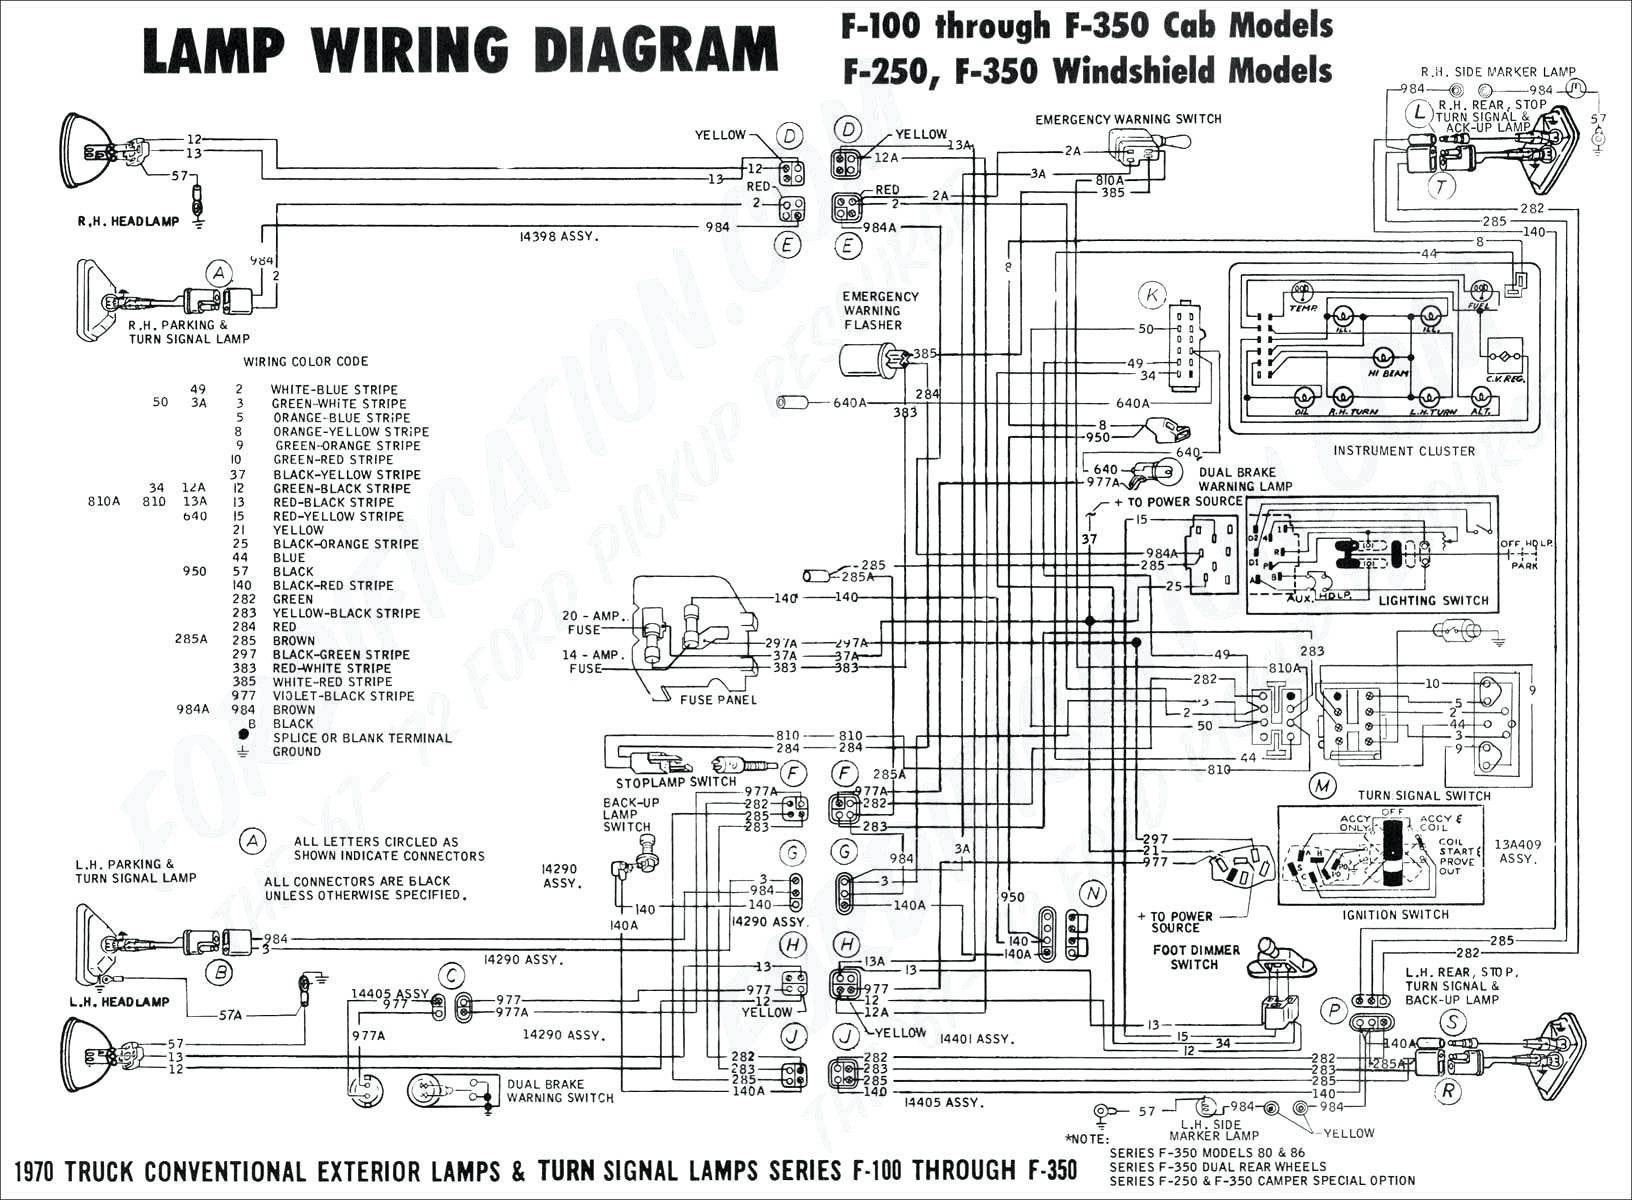 Vw 2 0 Engine Diagram 2 Vw R32 Wiring Diagram Experts Wiring Diagram • Of Vw 2 0 Engine Diagram 2